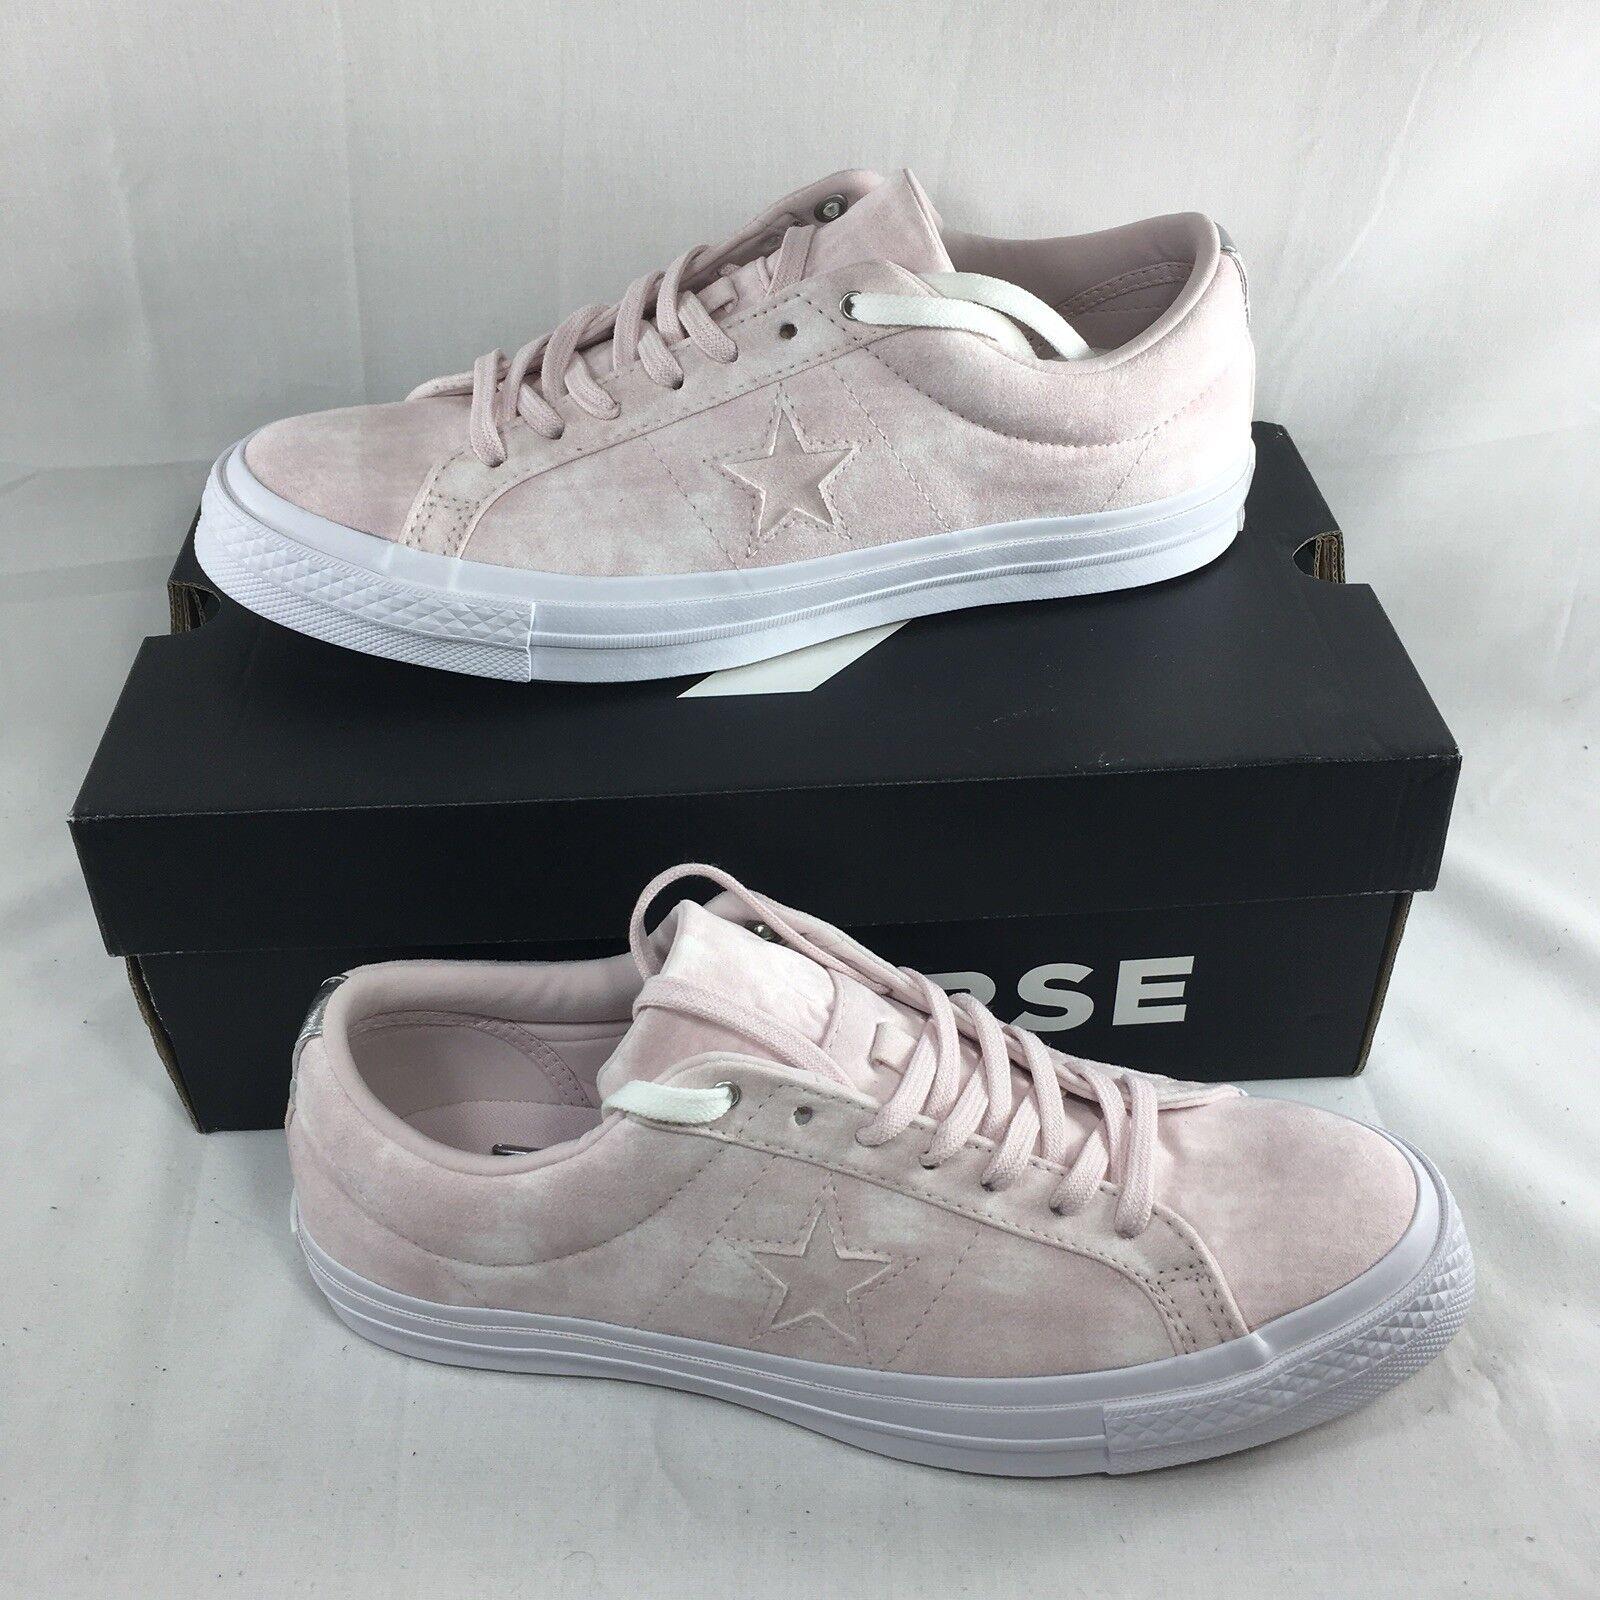 Converse One One Converse Star Ox Zapatos Mujeres 10 hombres 8 rosado rosado 159711C Gamuza Patineta 223beb